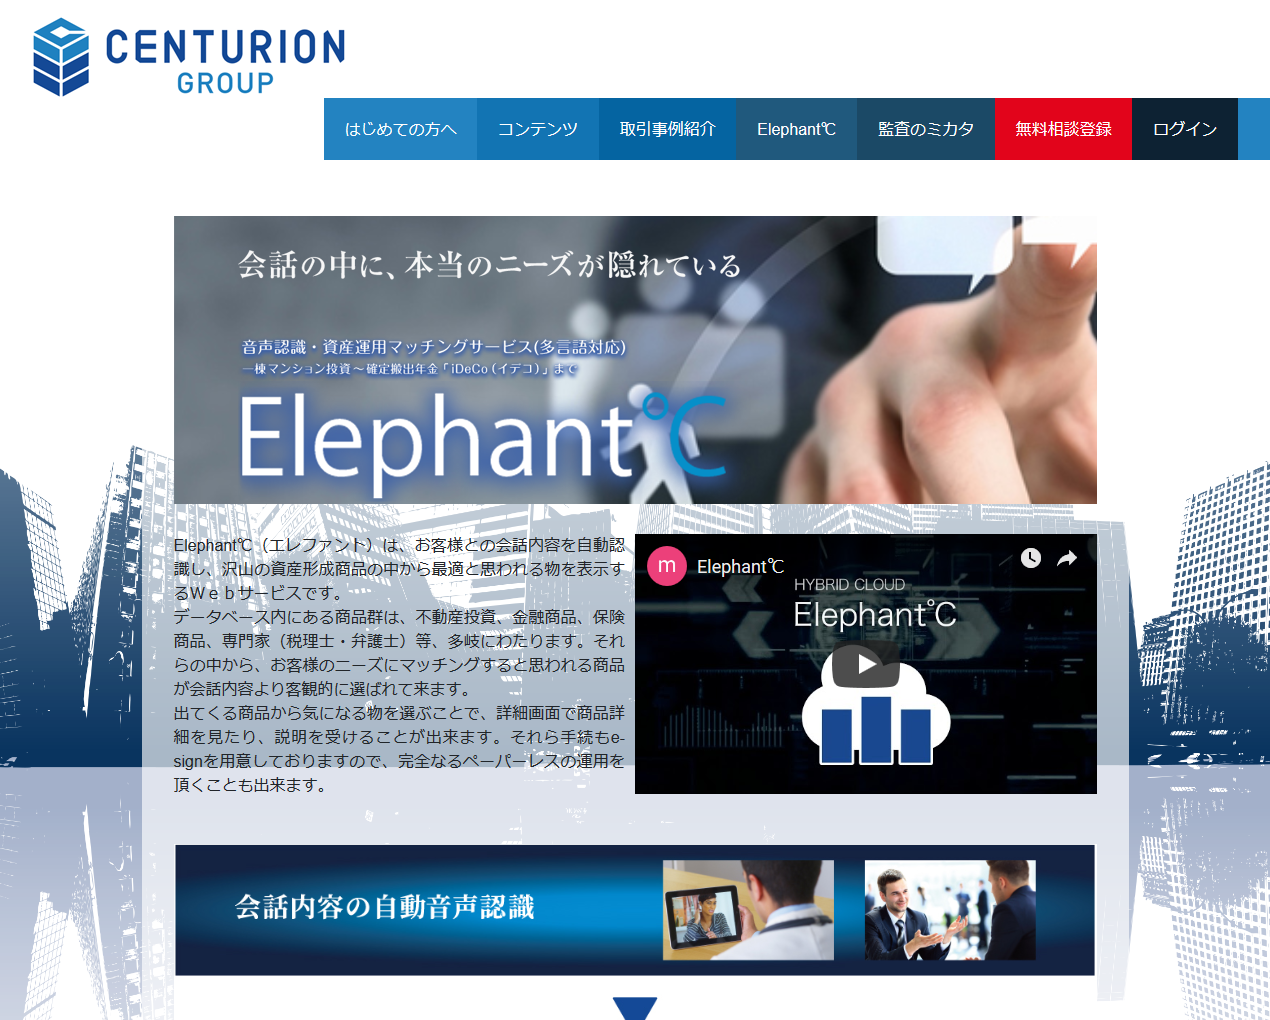 「Elephant℃」は、面談を通した会話内容の音声認識を行い、お客様に適した投資商品を提示するWebサービスです。